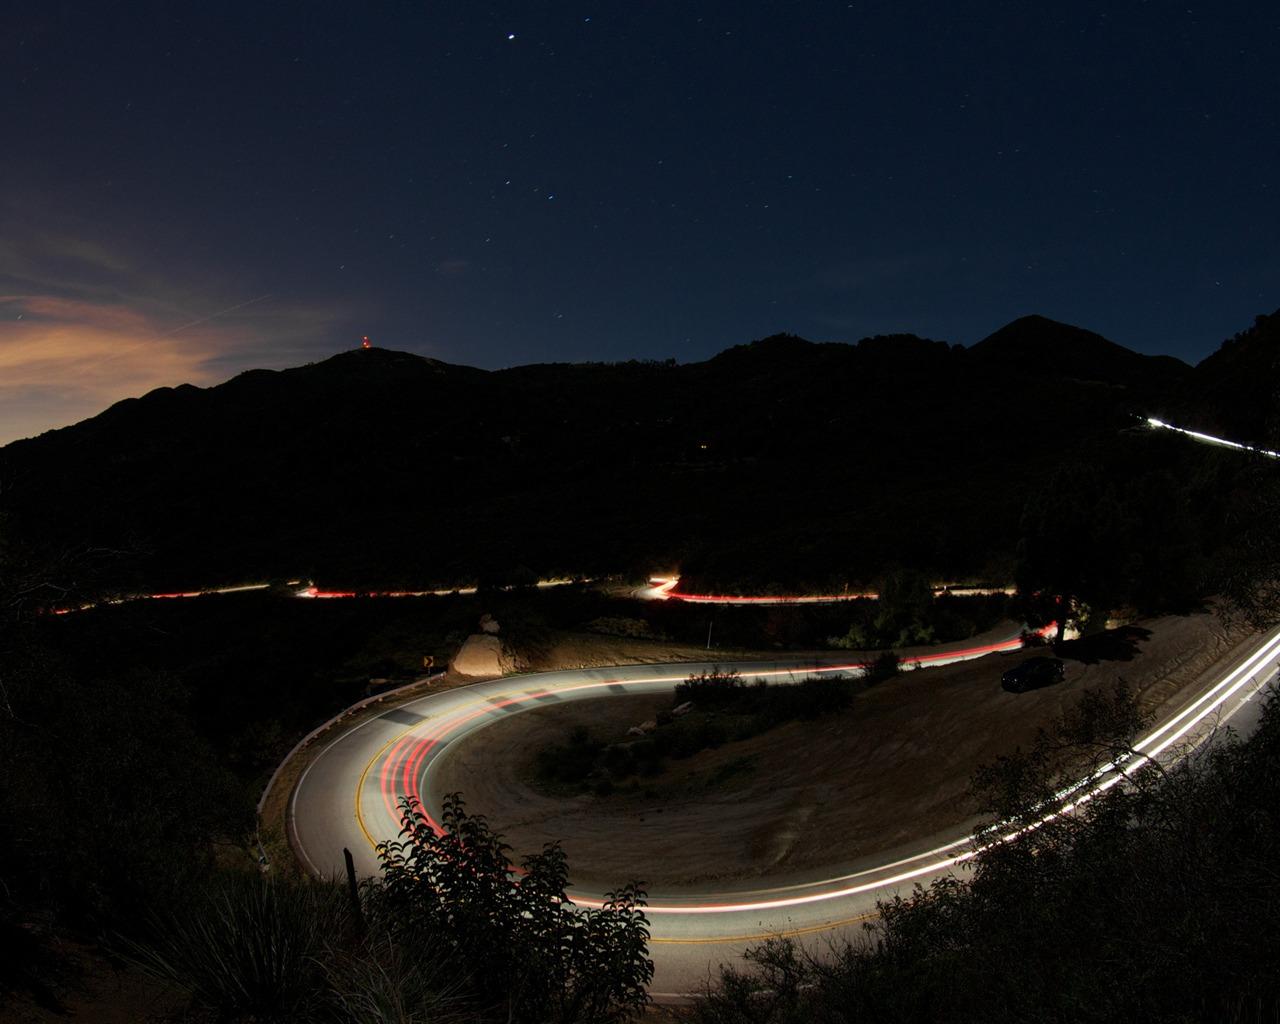 Mountain Road Night Lights Beautiful Natural Scenery